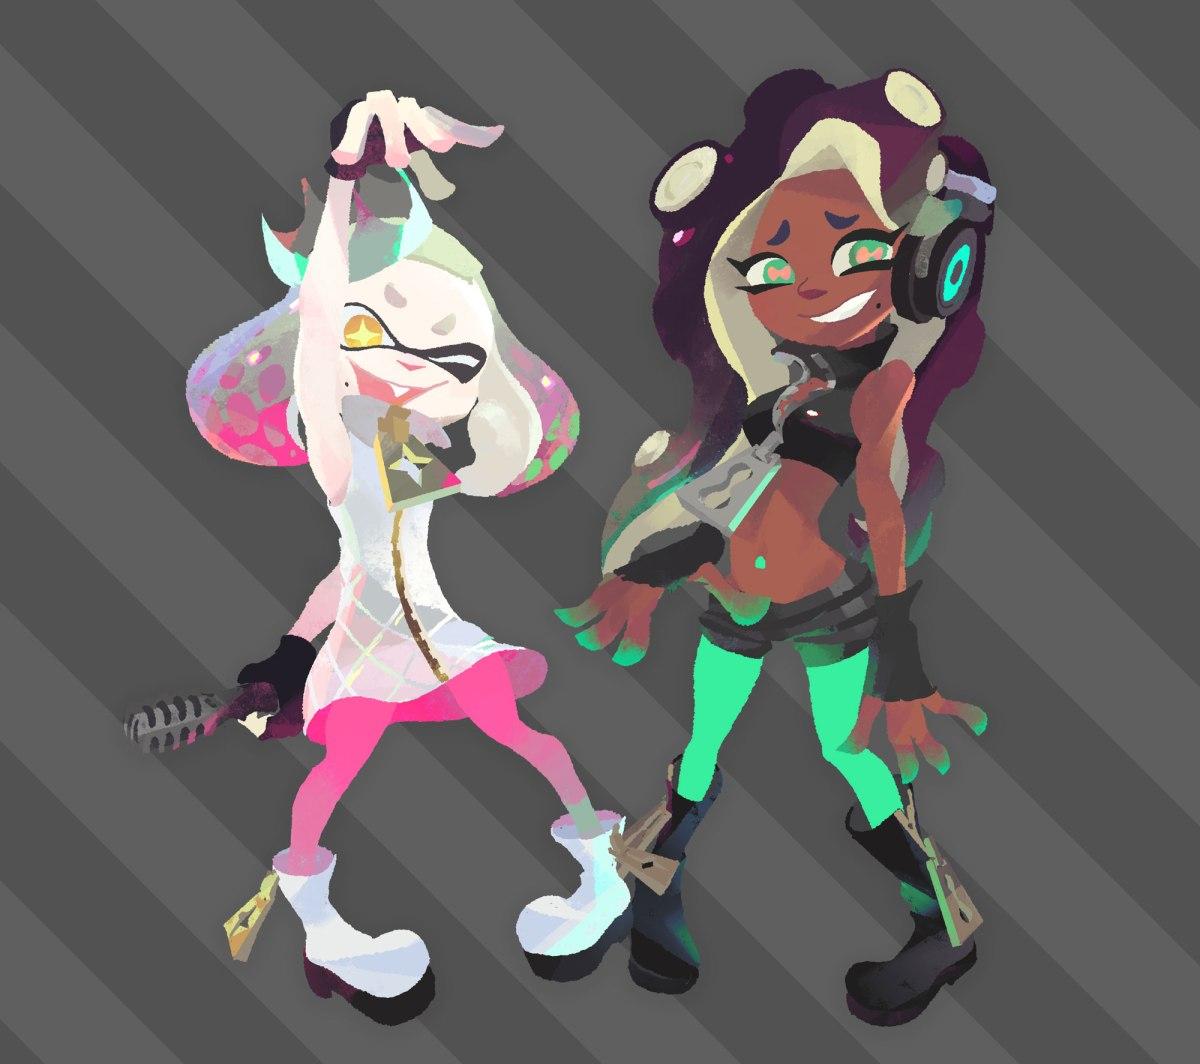 Splatoon2 illustraion of Off The Hook hosts Pearl and Marina. From Nintendo